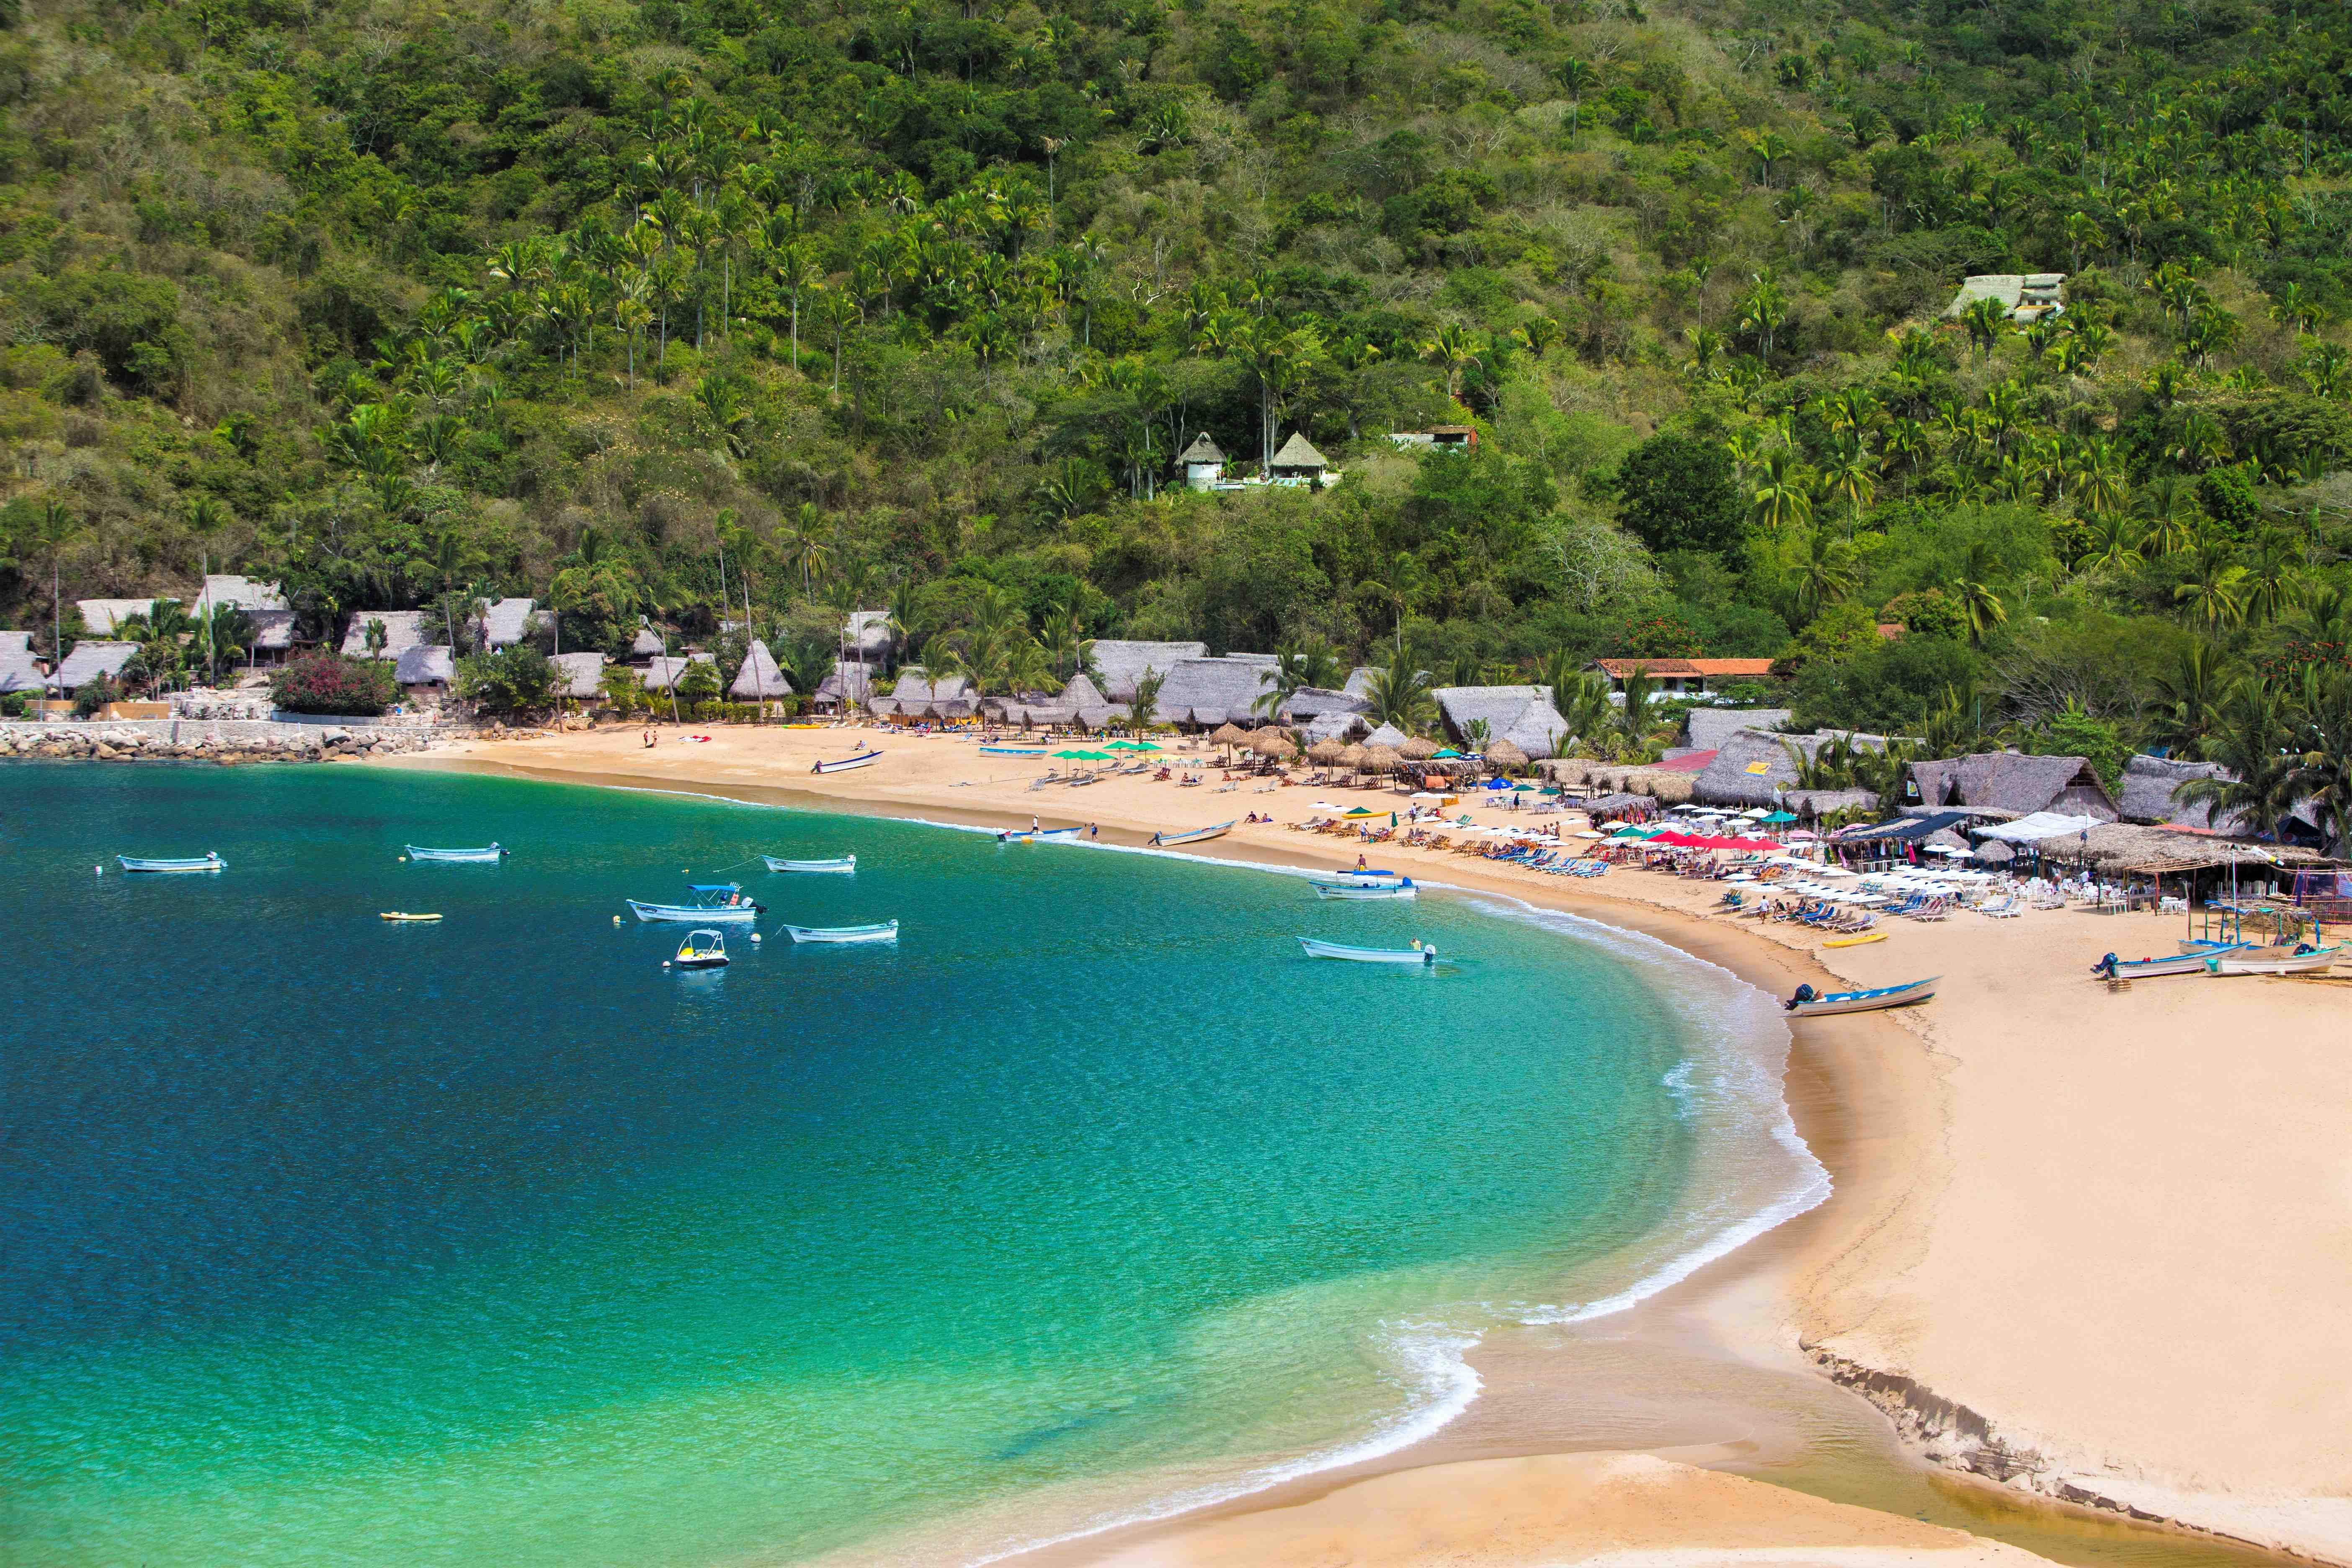 Yelapa And Majahuitas Tour - Last Minute Tours in Puerto Vallarta